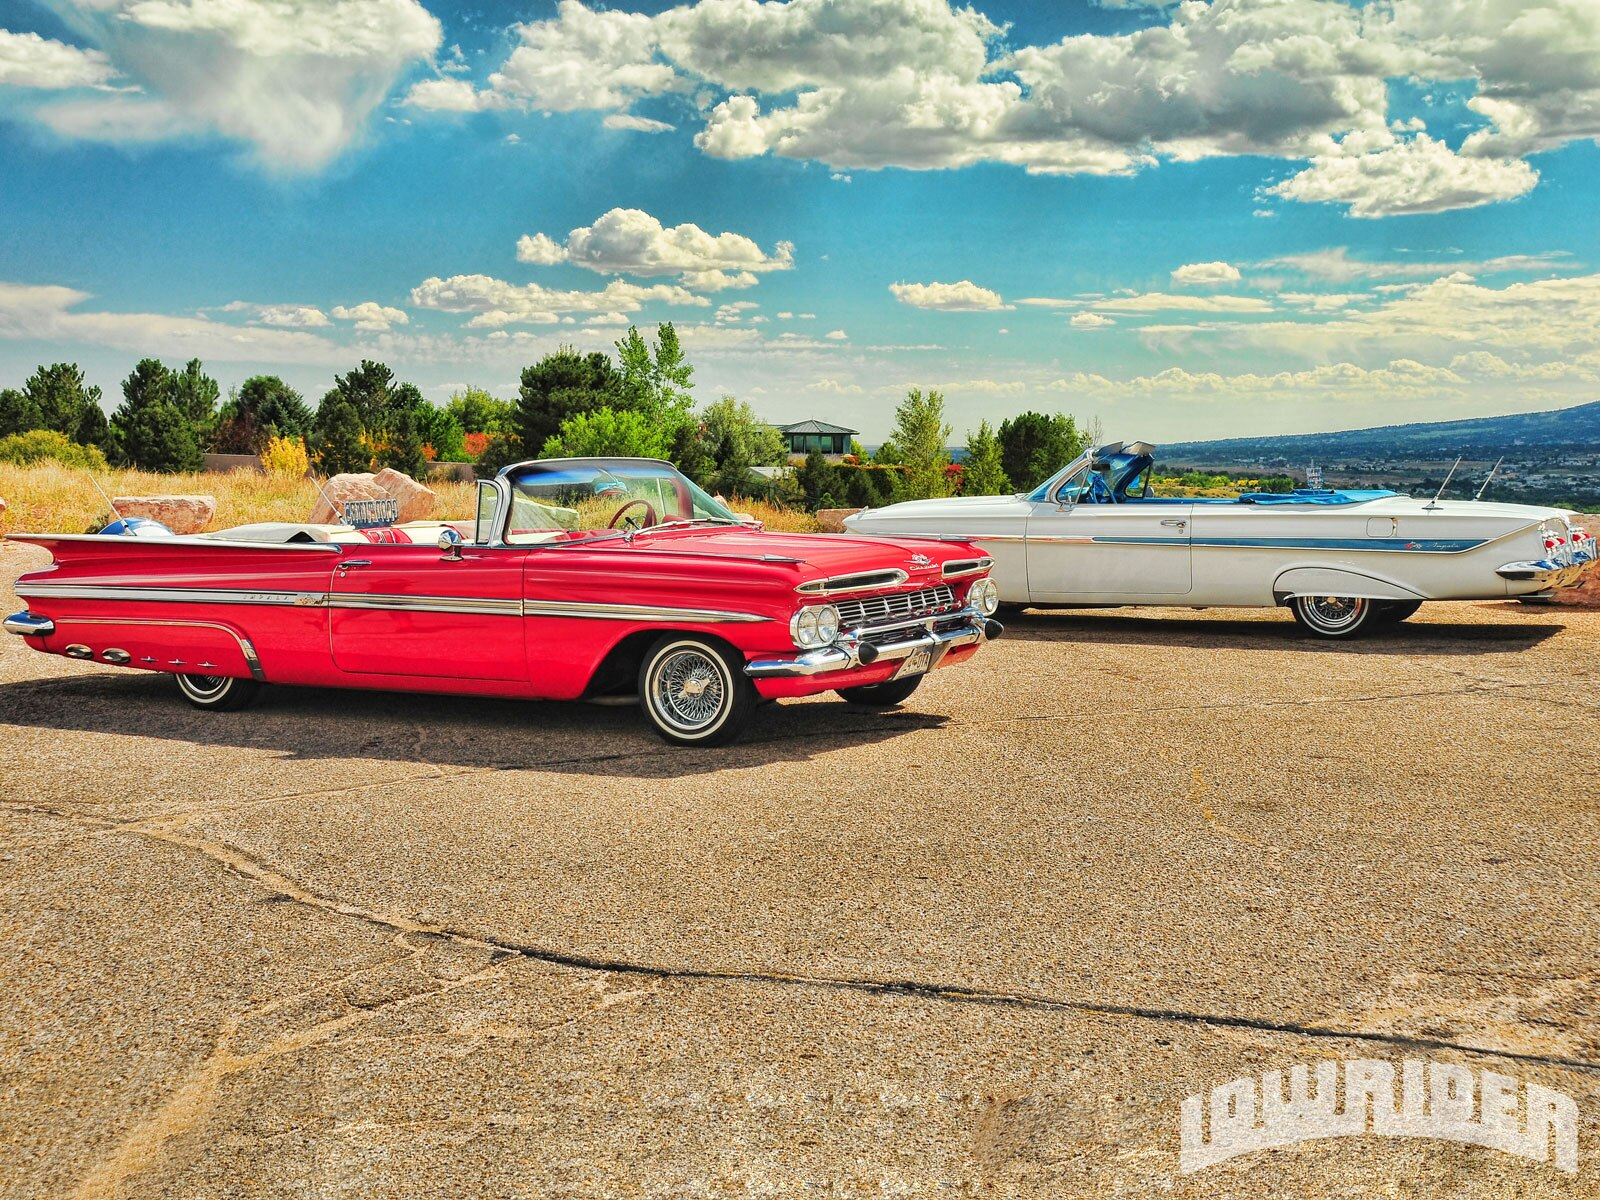 1206-lrmp-01-o-1961-chevrolet-impala-1959-chevrolet-impala-side-view1